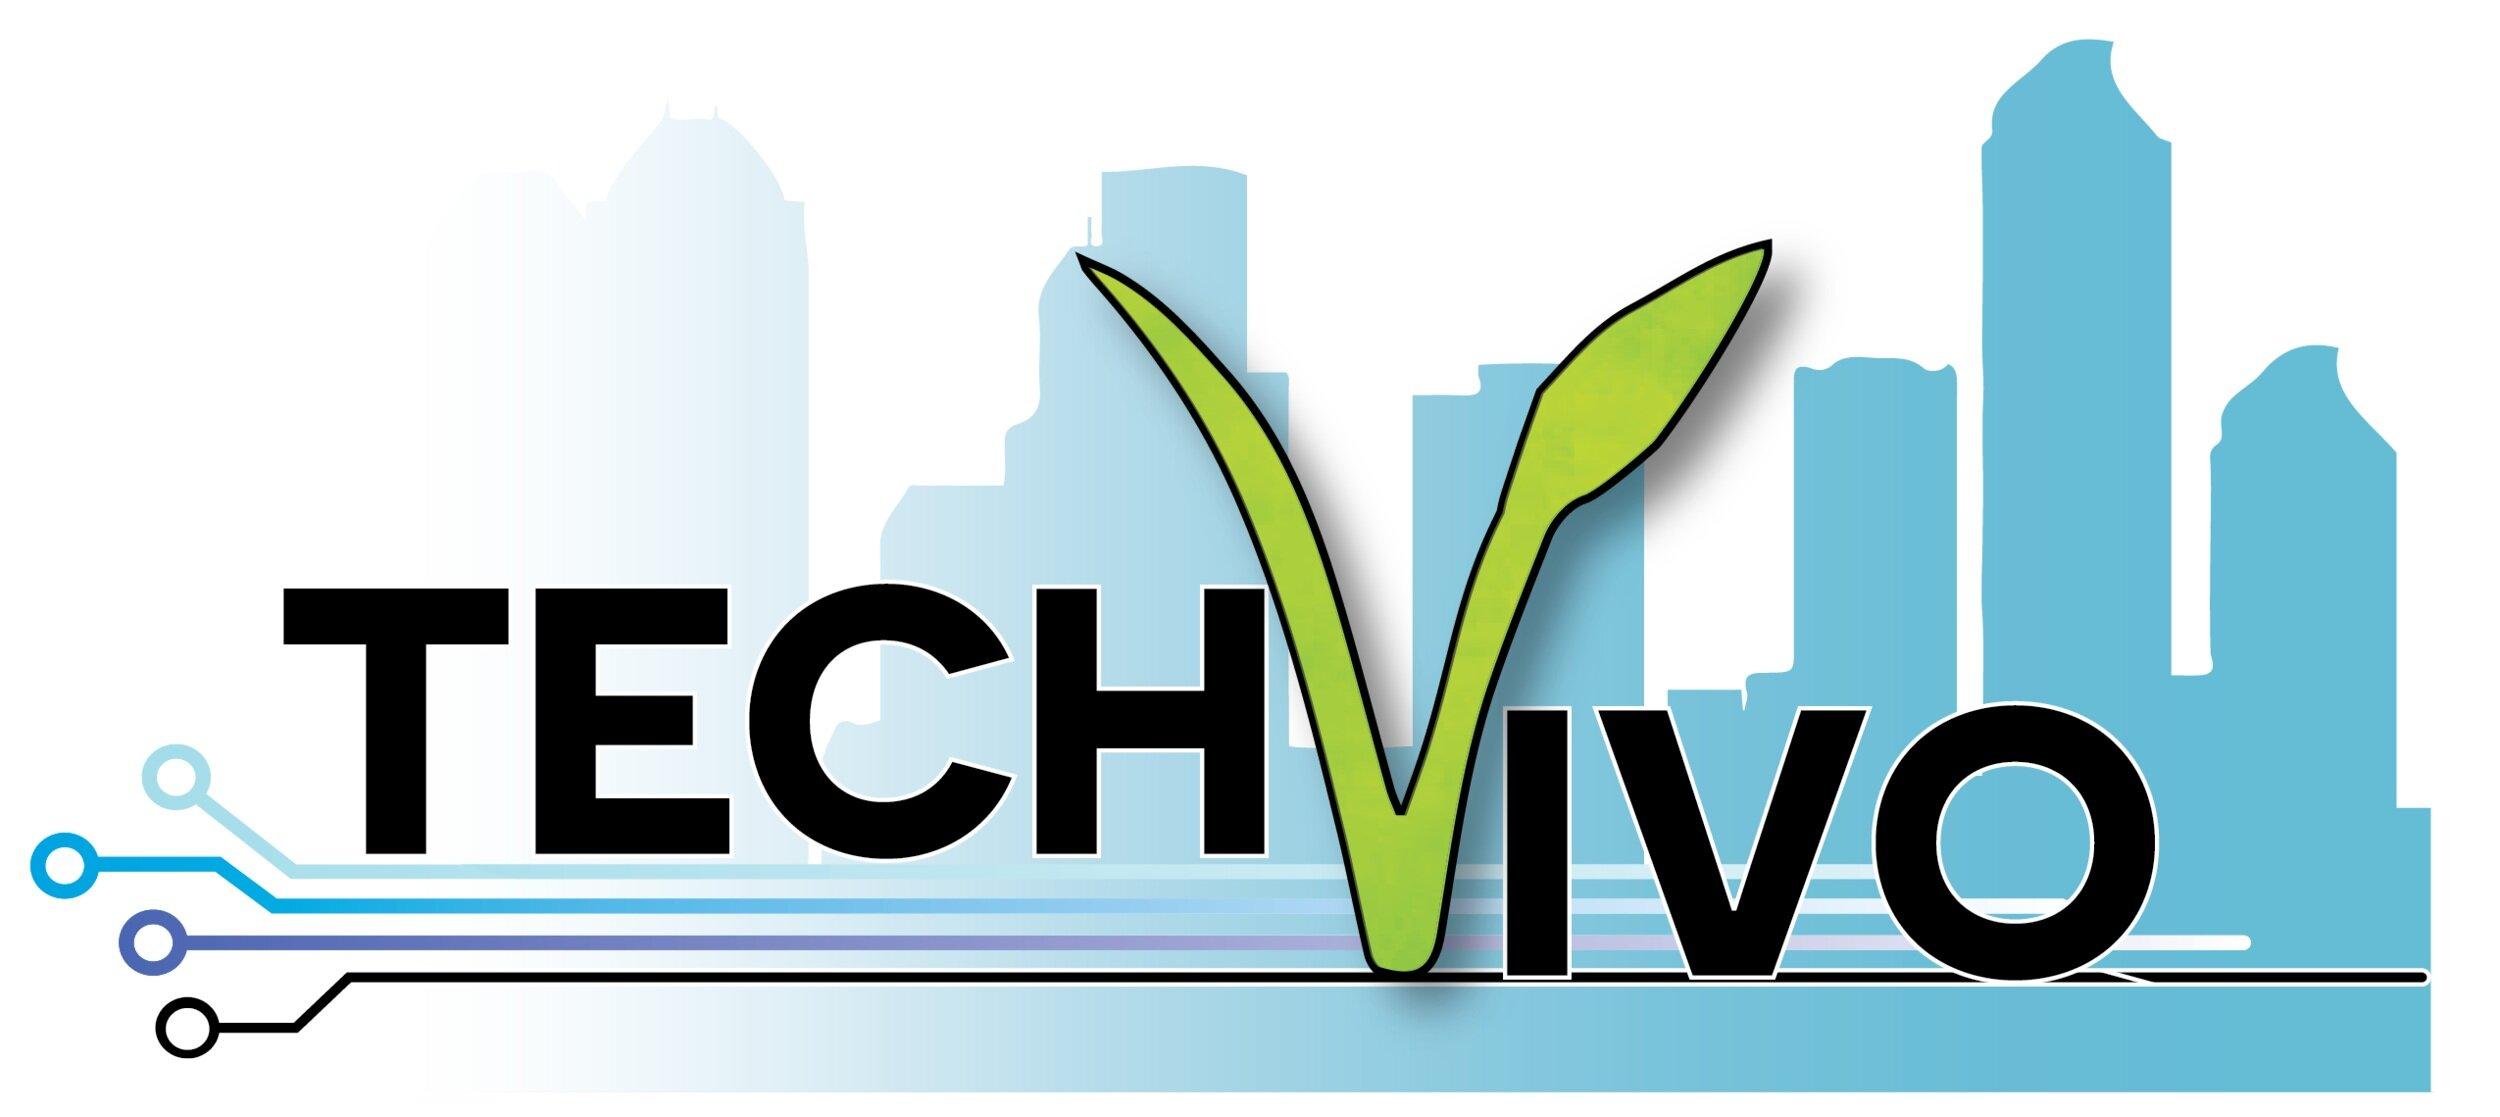 TechVivo+Horizontal+White+PNG.jpg